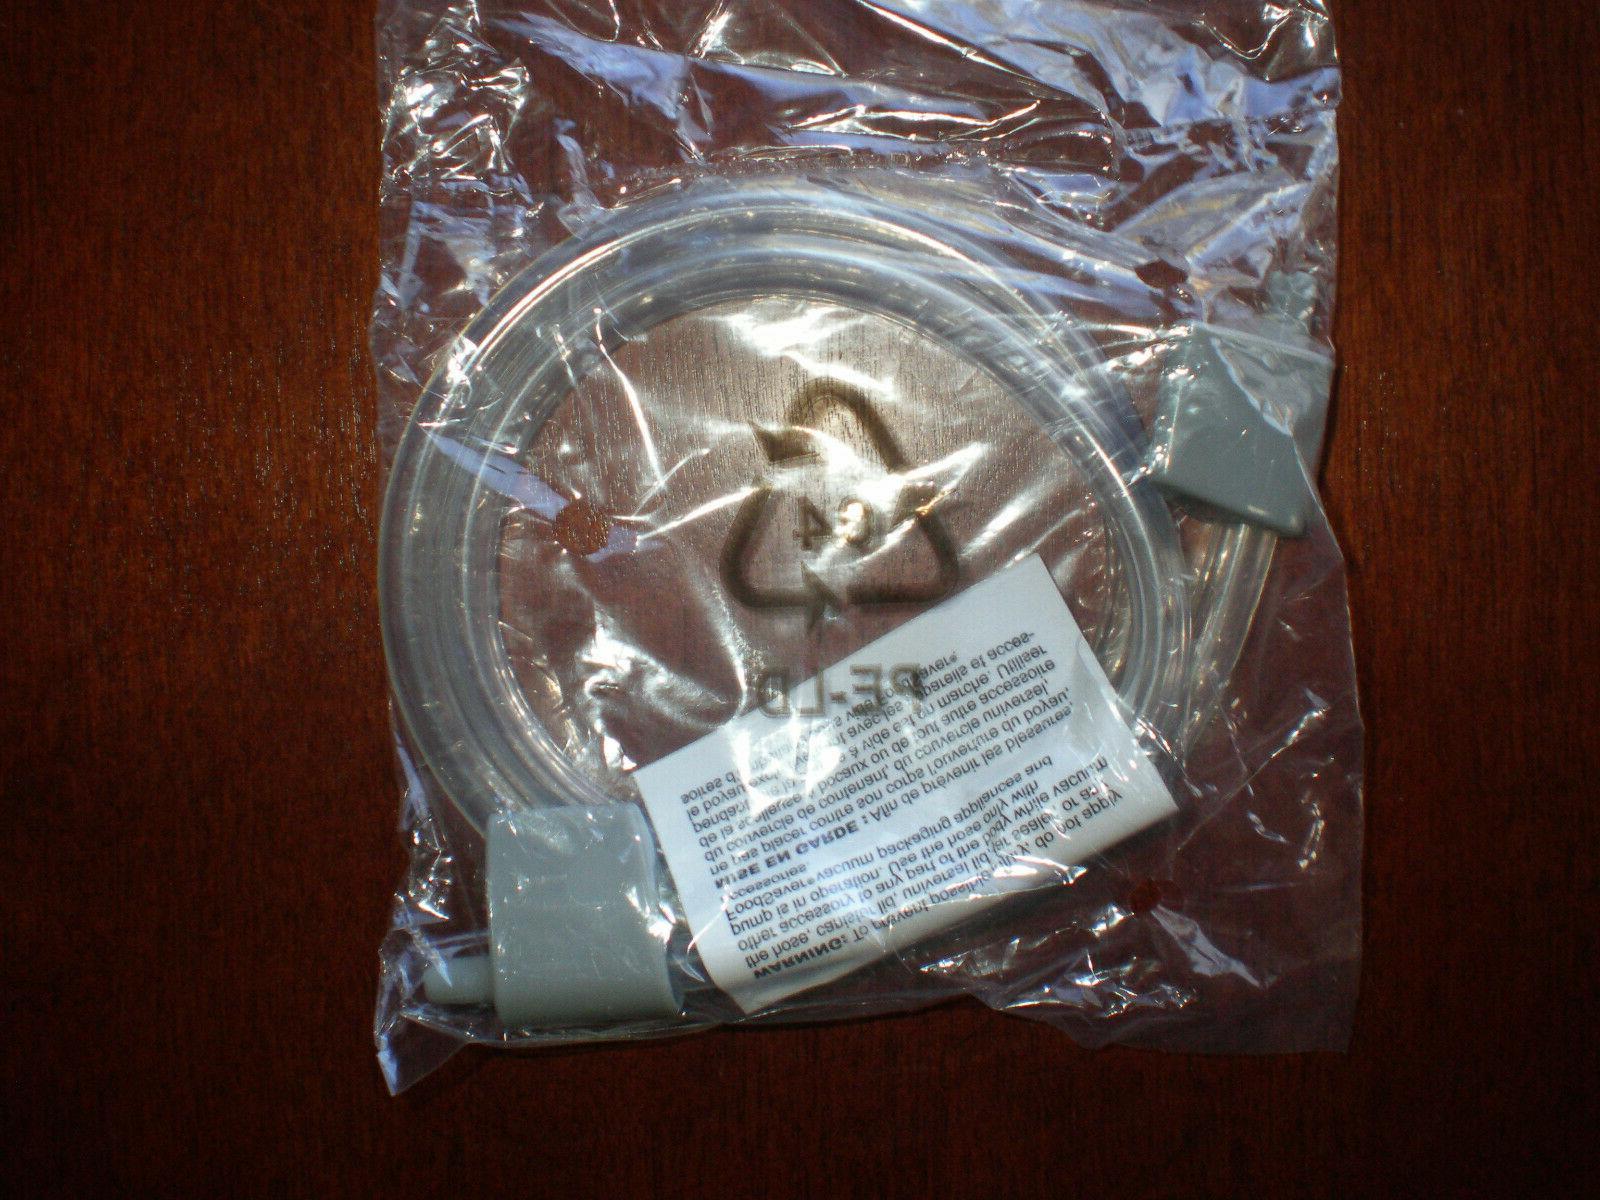 nip replacement 26 suction hose for vacuum